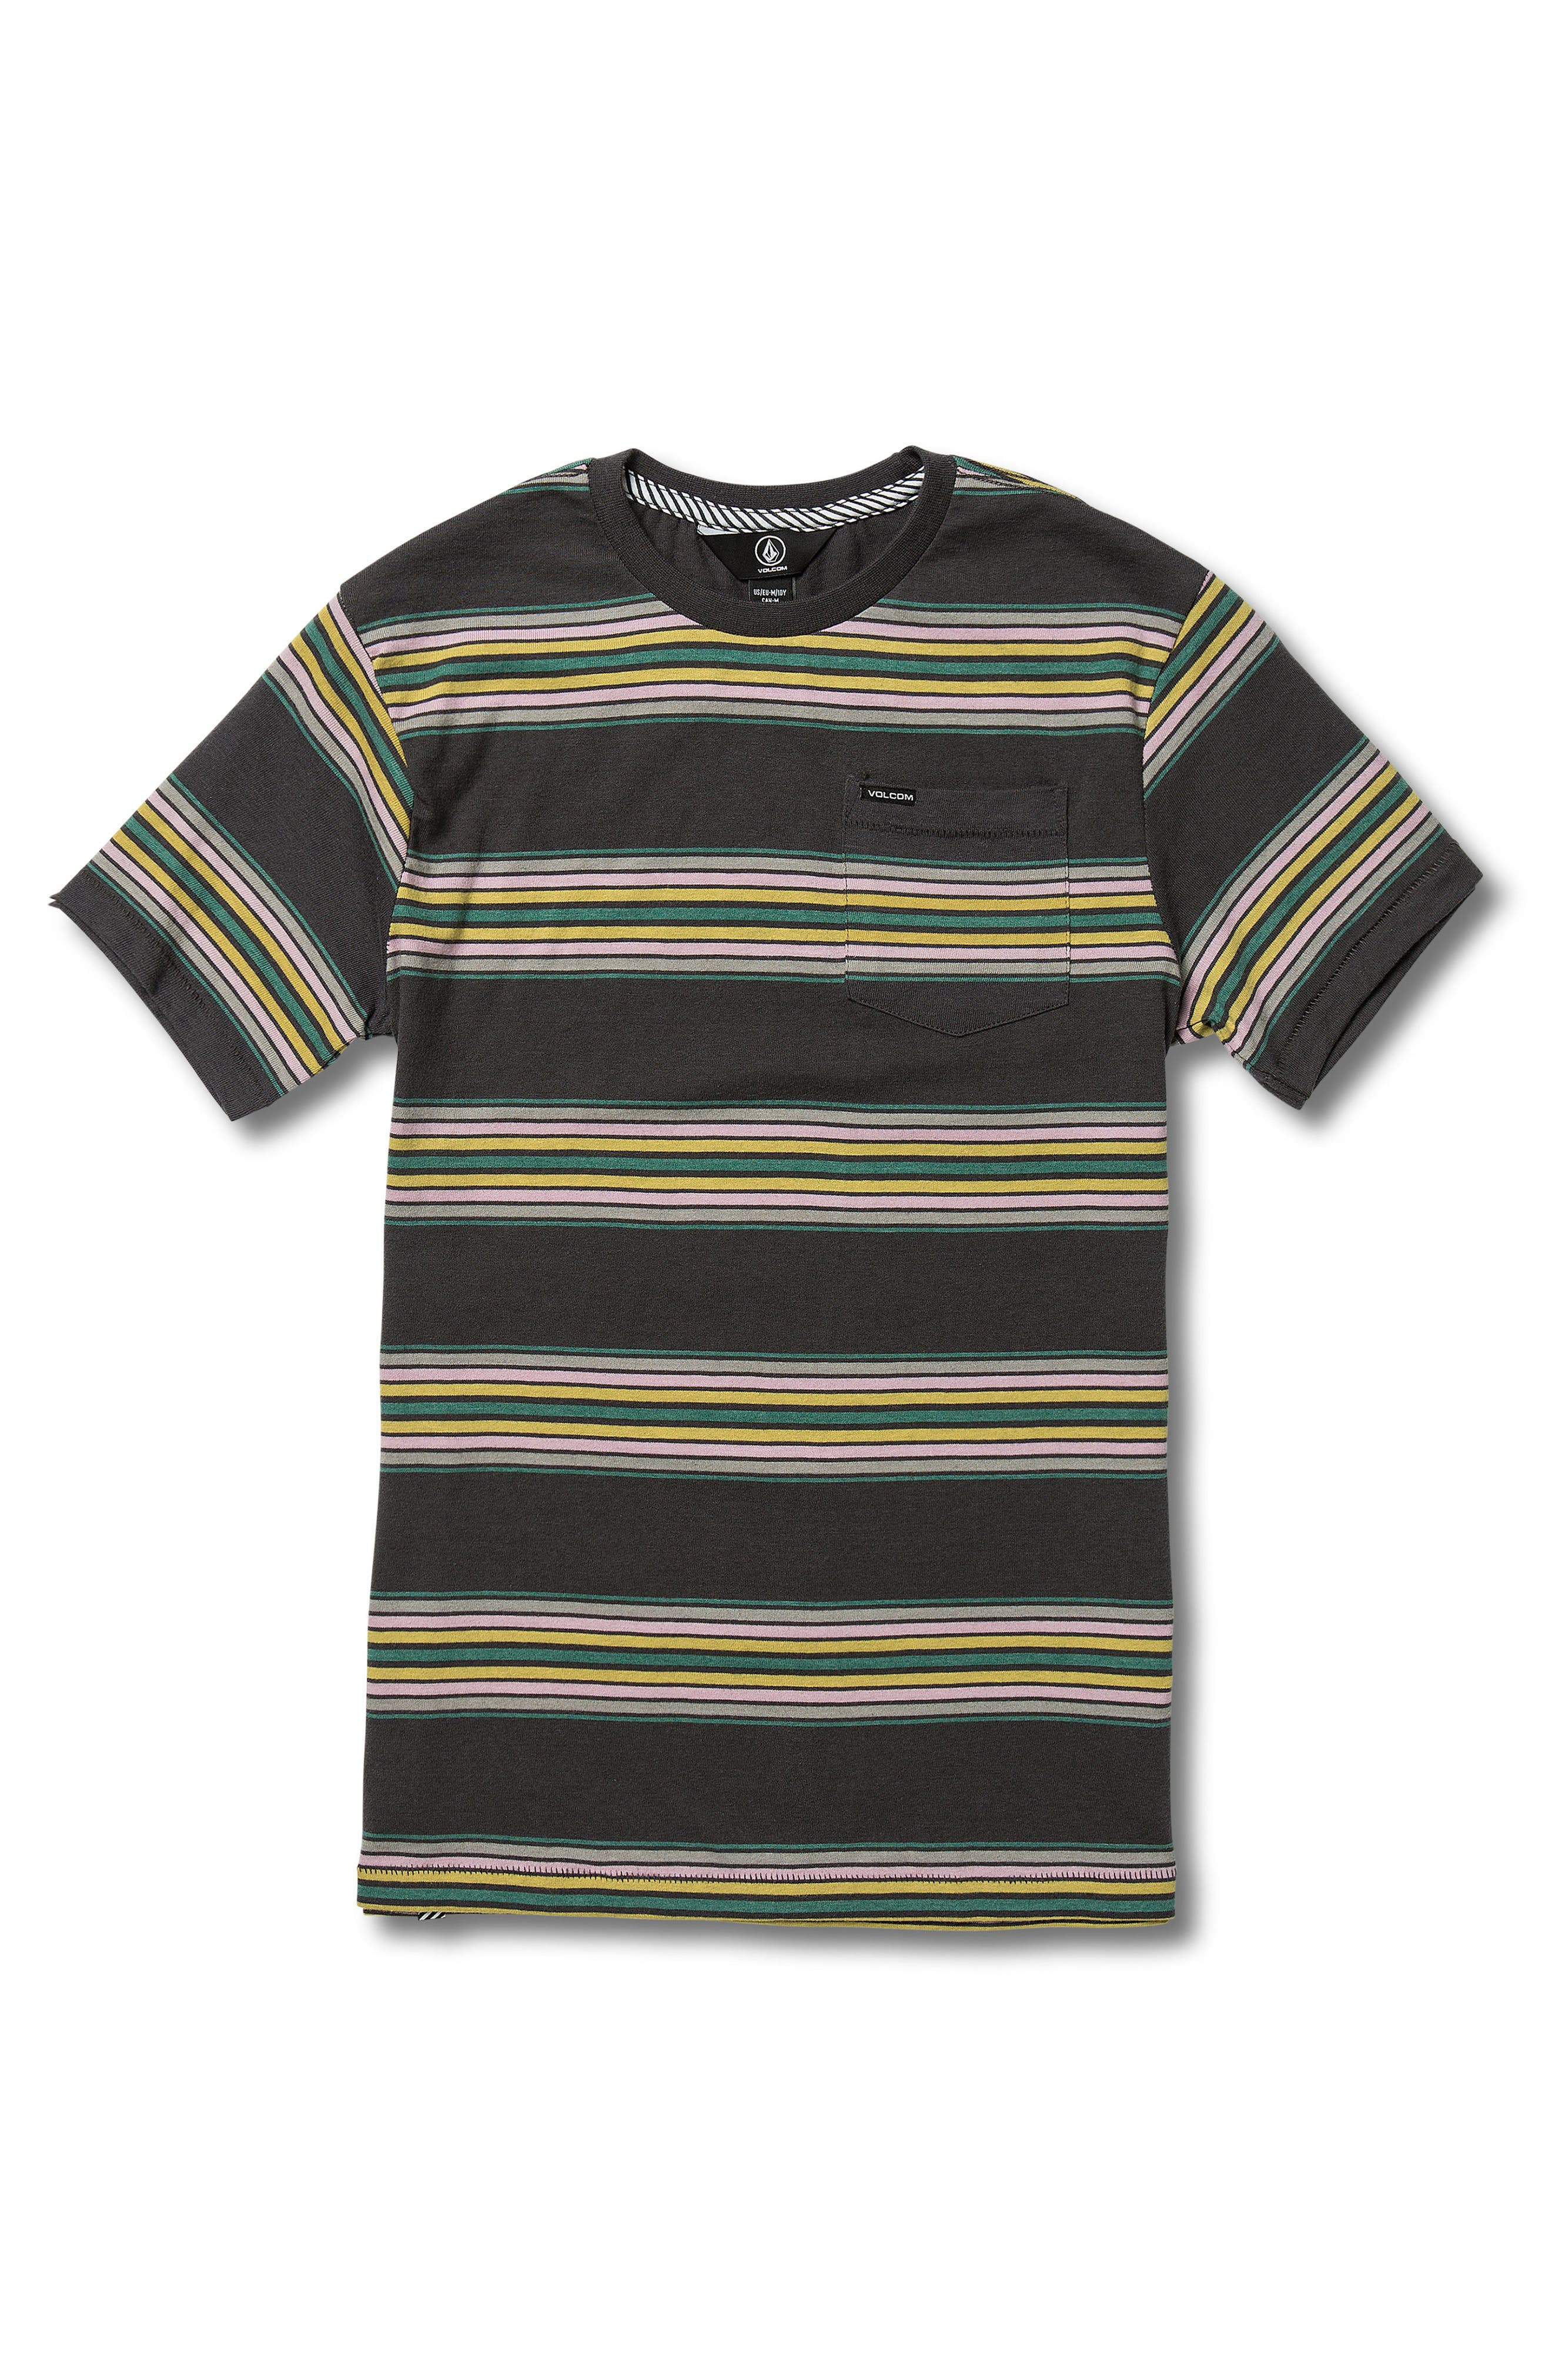 Idle T-Shirt,                             Main thumbnail 1, color,                             ASPHALT BL